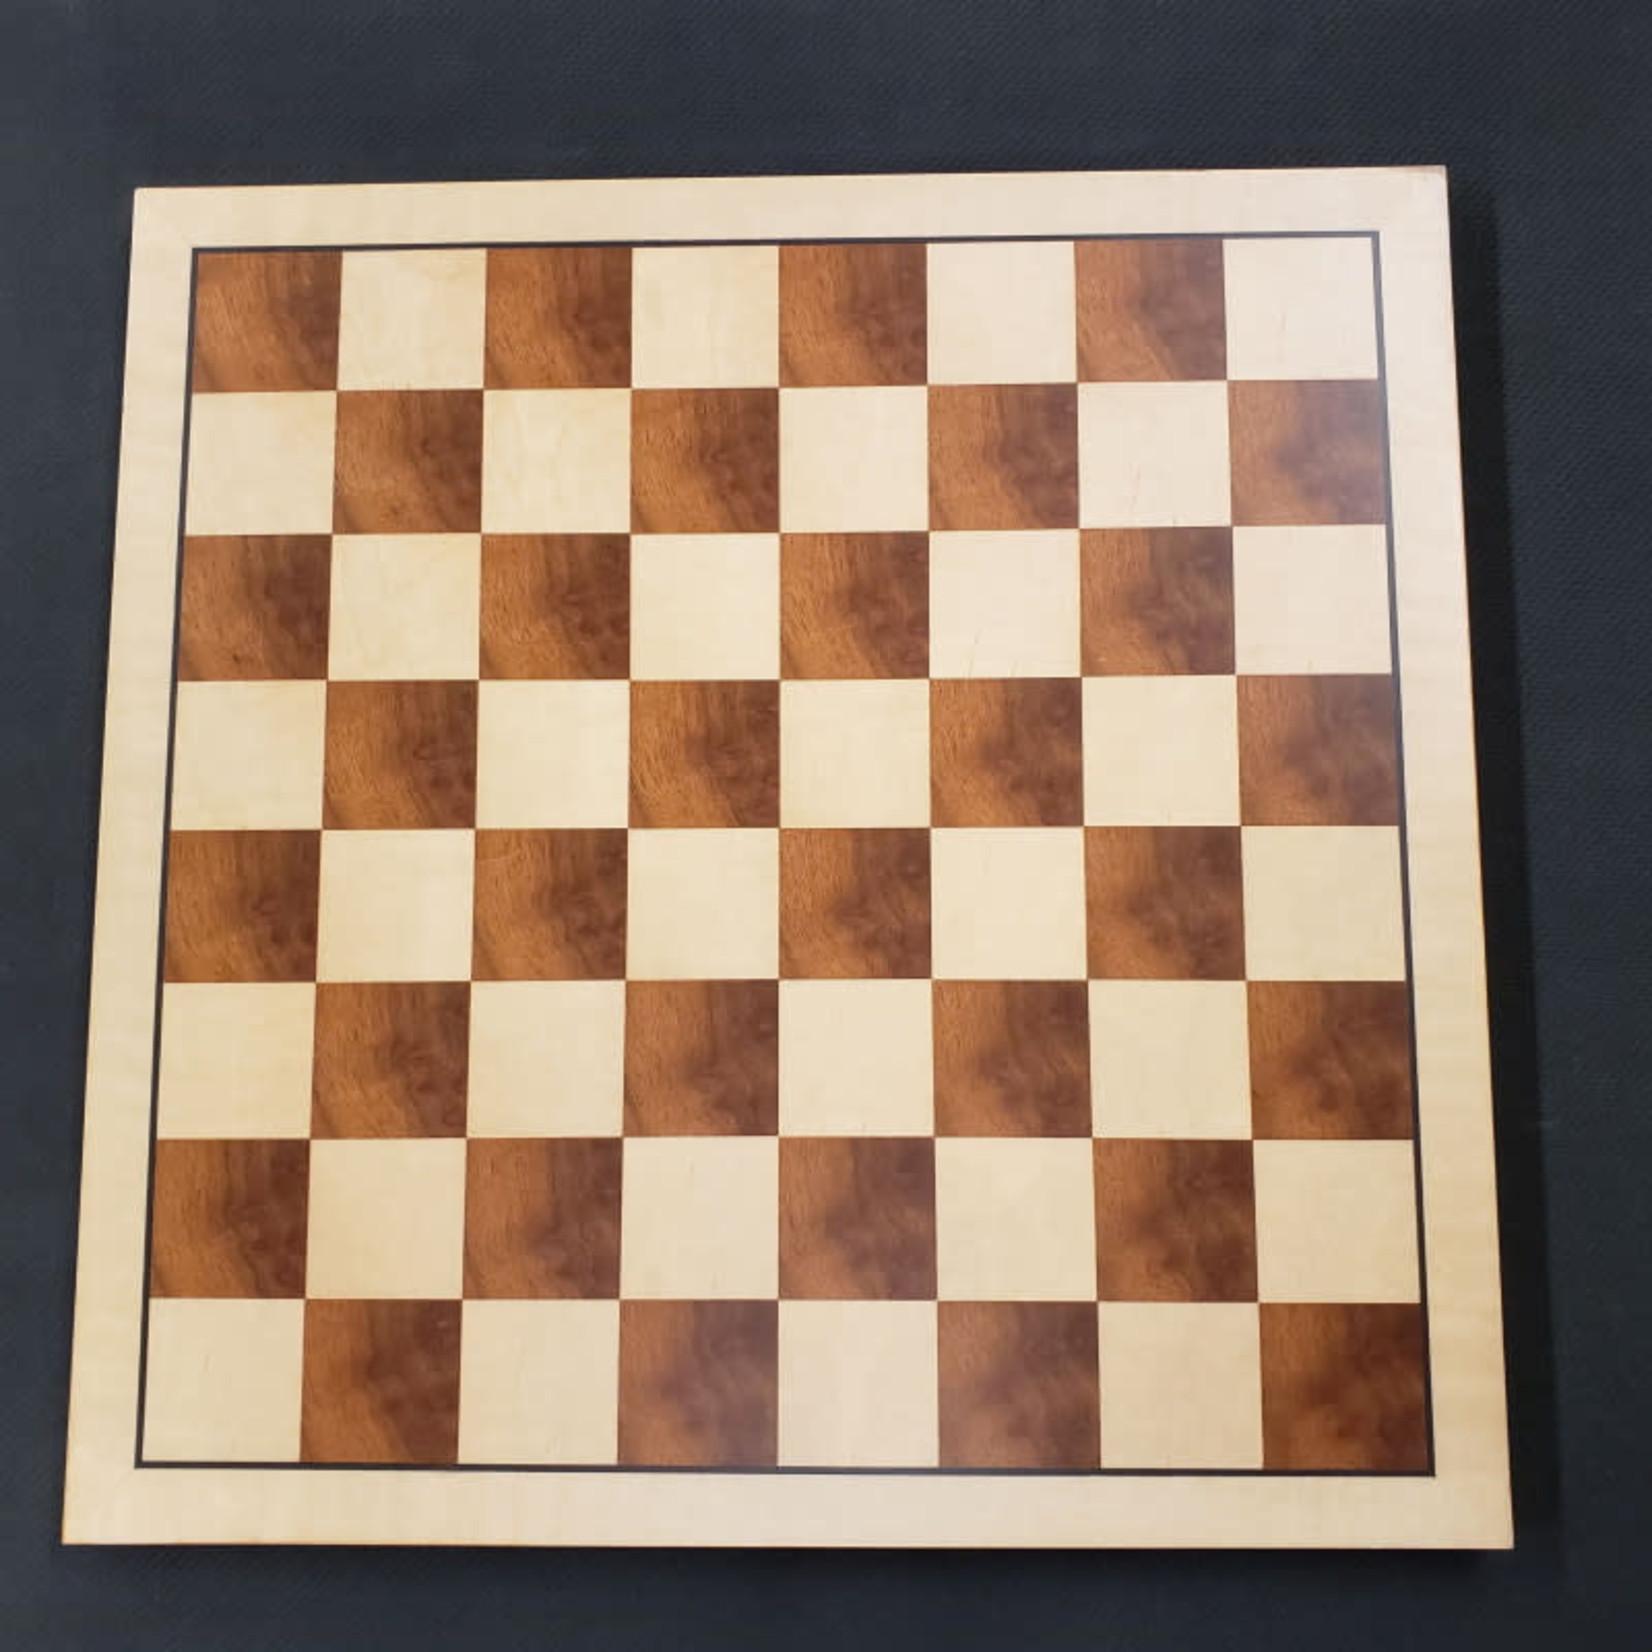 "Wood Expressions Chess Board 16"" Natural/Camphor"